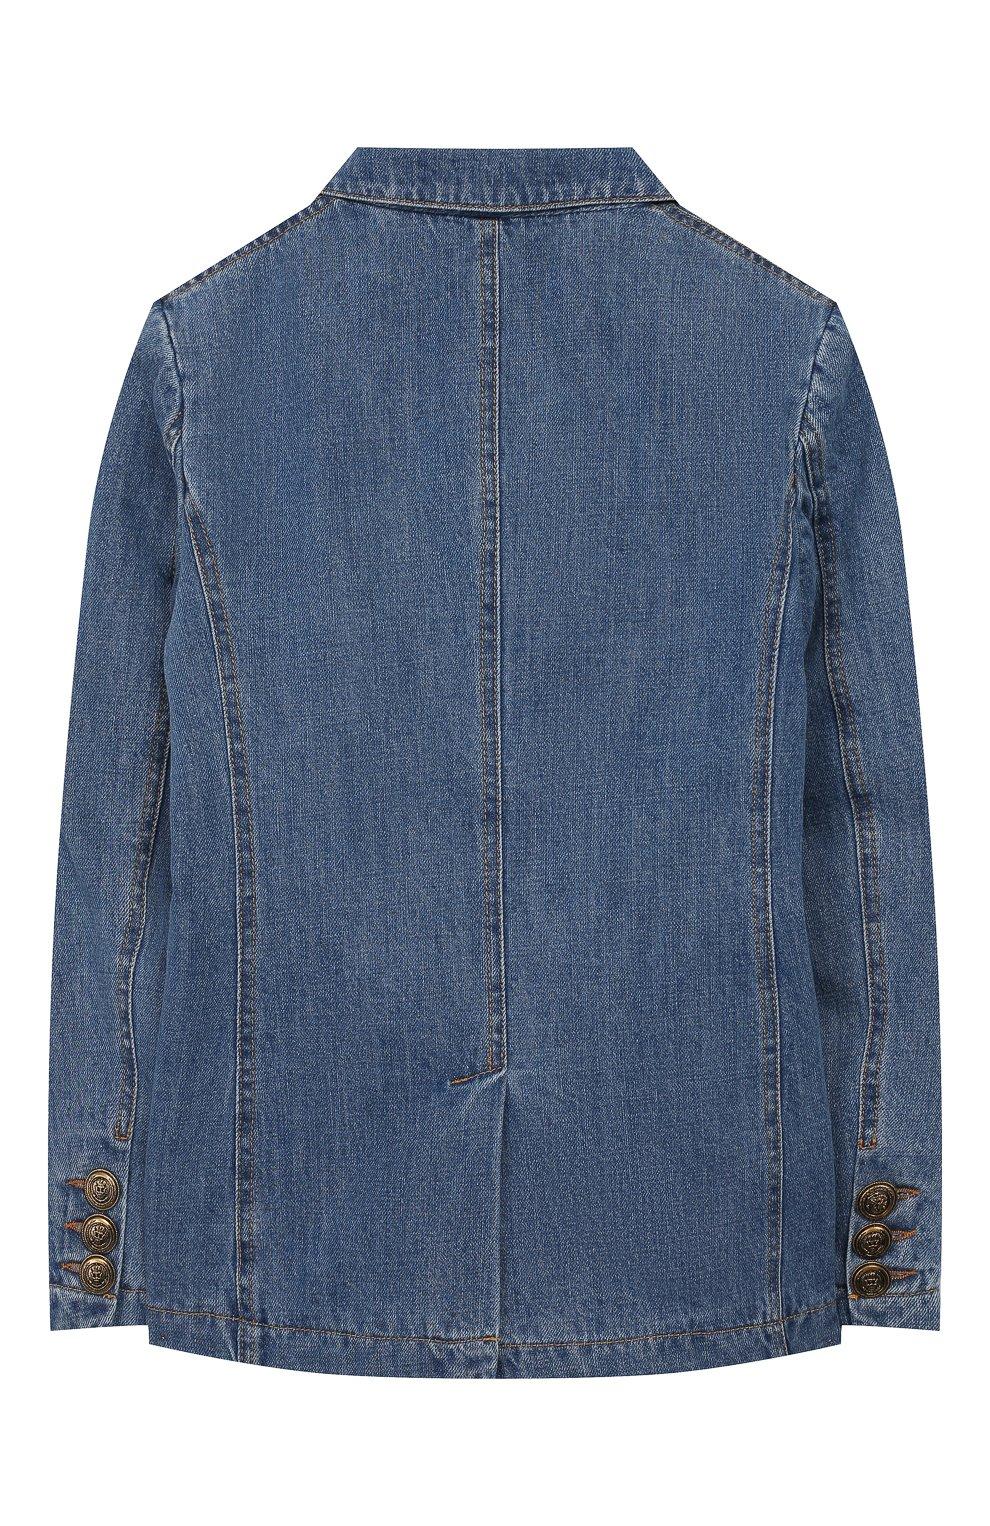 Детский джинсовый жакет PHILOSOPHY DI LORENZO SERAFINI KIDS синего цвета, арт. PJGC07/DF003/VHUNI/S-M | Фото 2